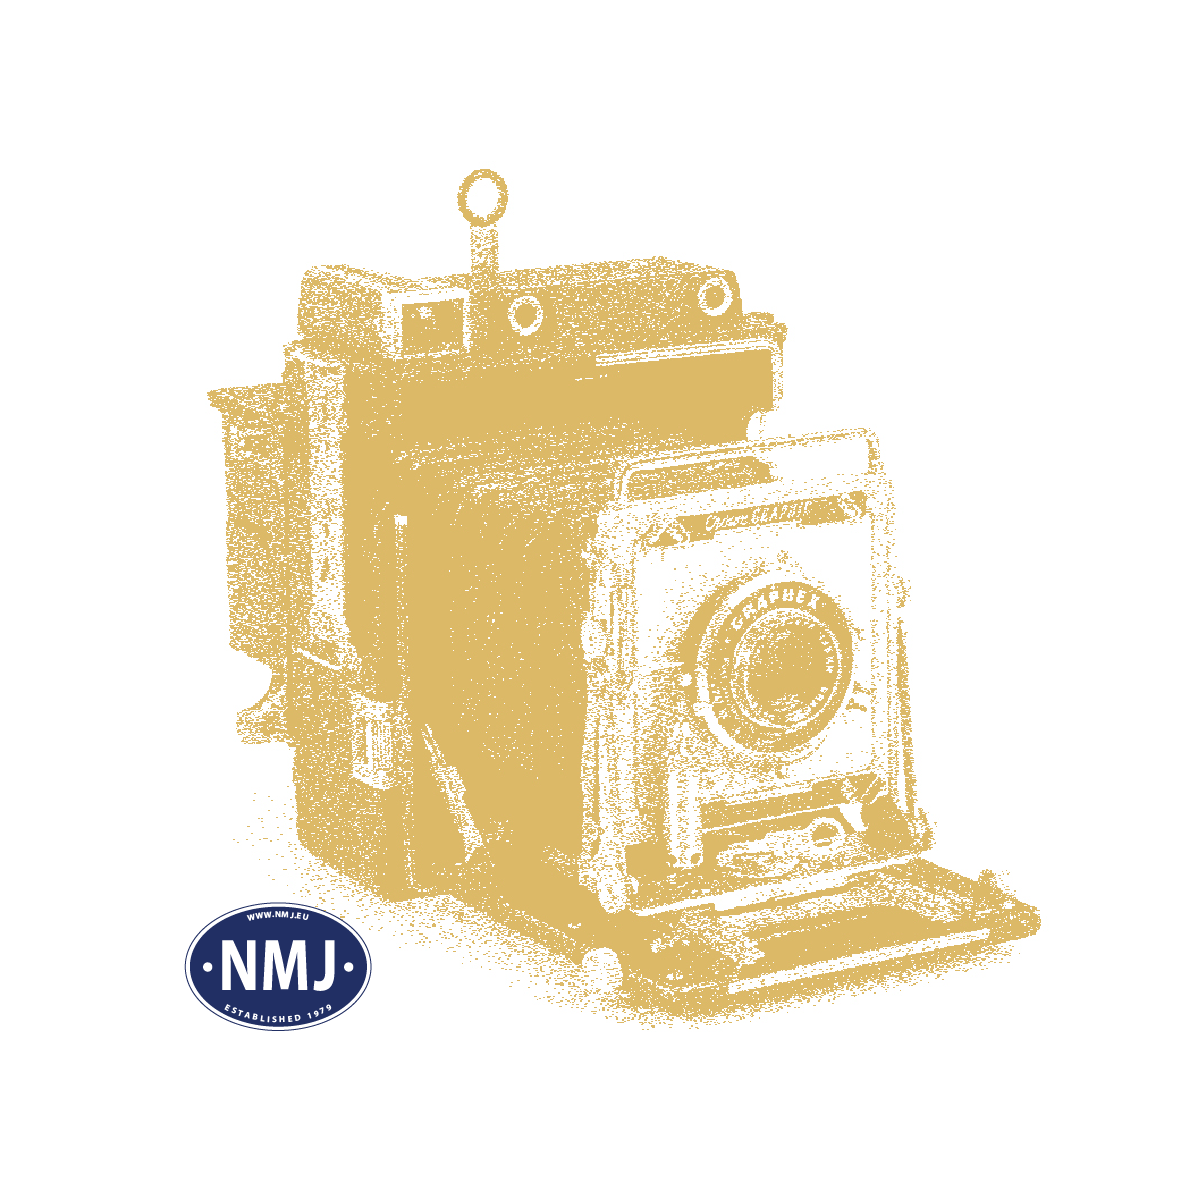 NMJT90209 - NMJ Topline MAV M61.007, DC